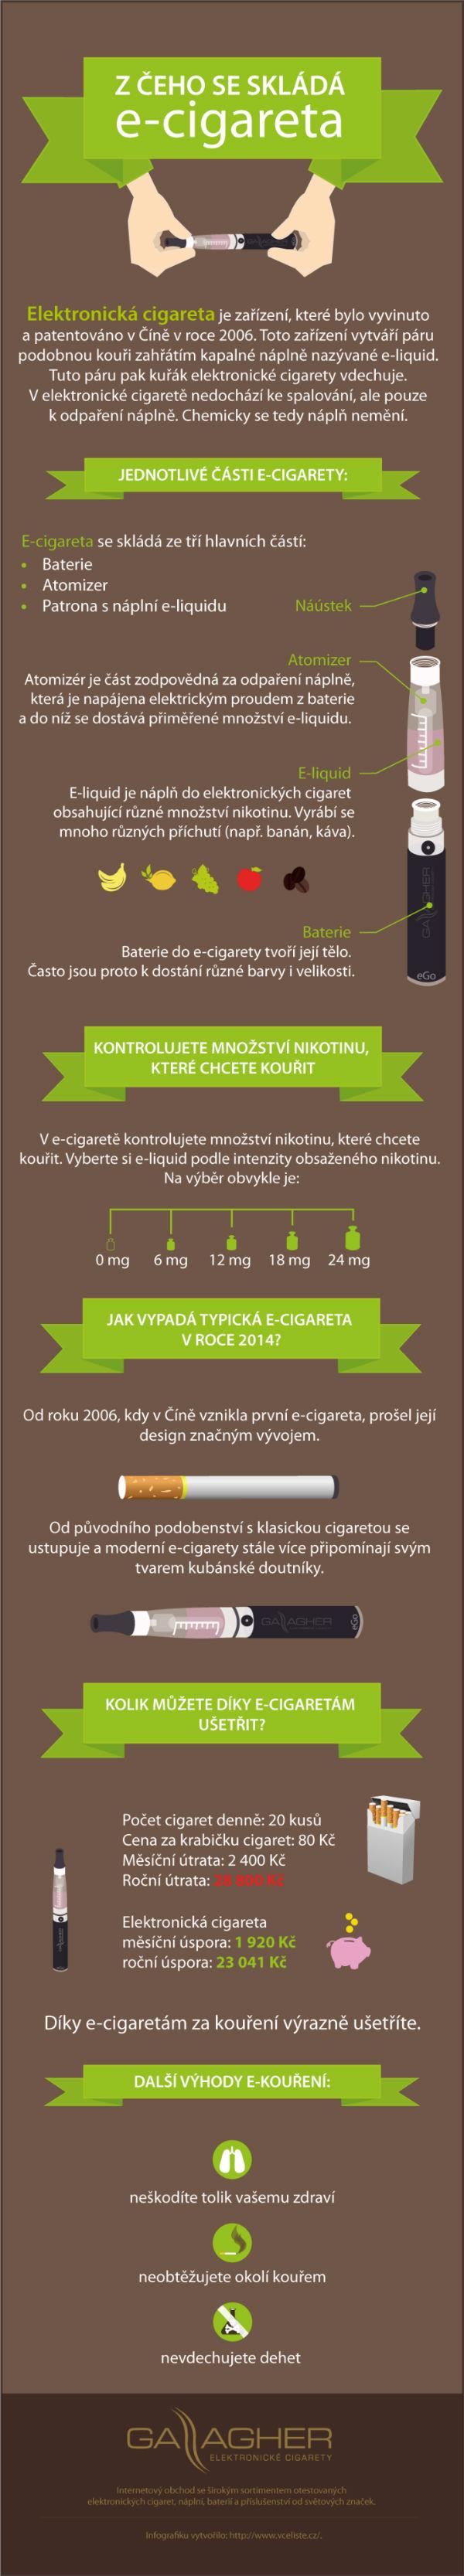 Infografika: Z čeho se skládá elektronická cigareta?